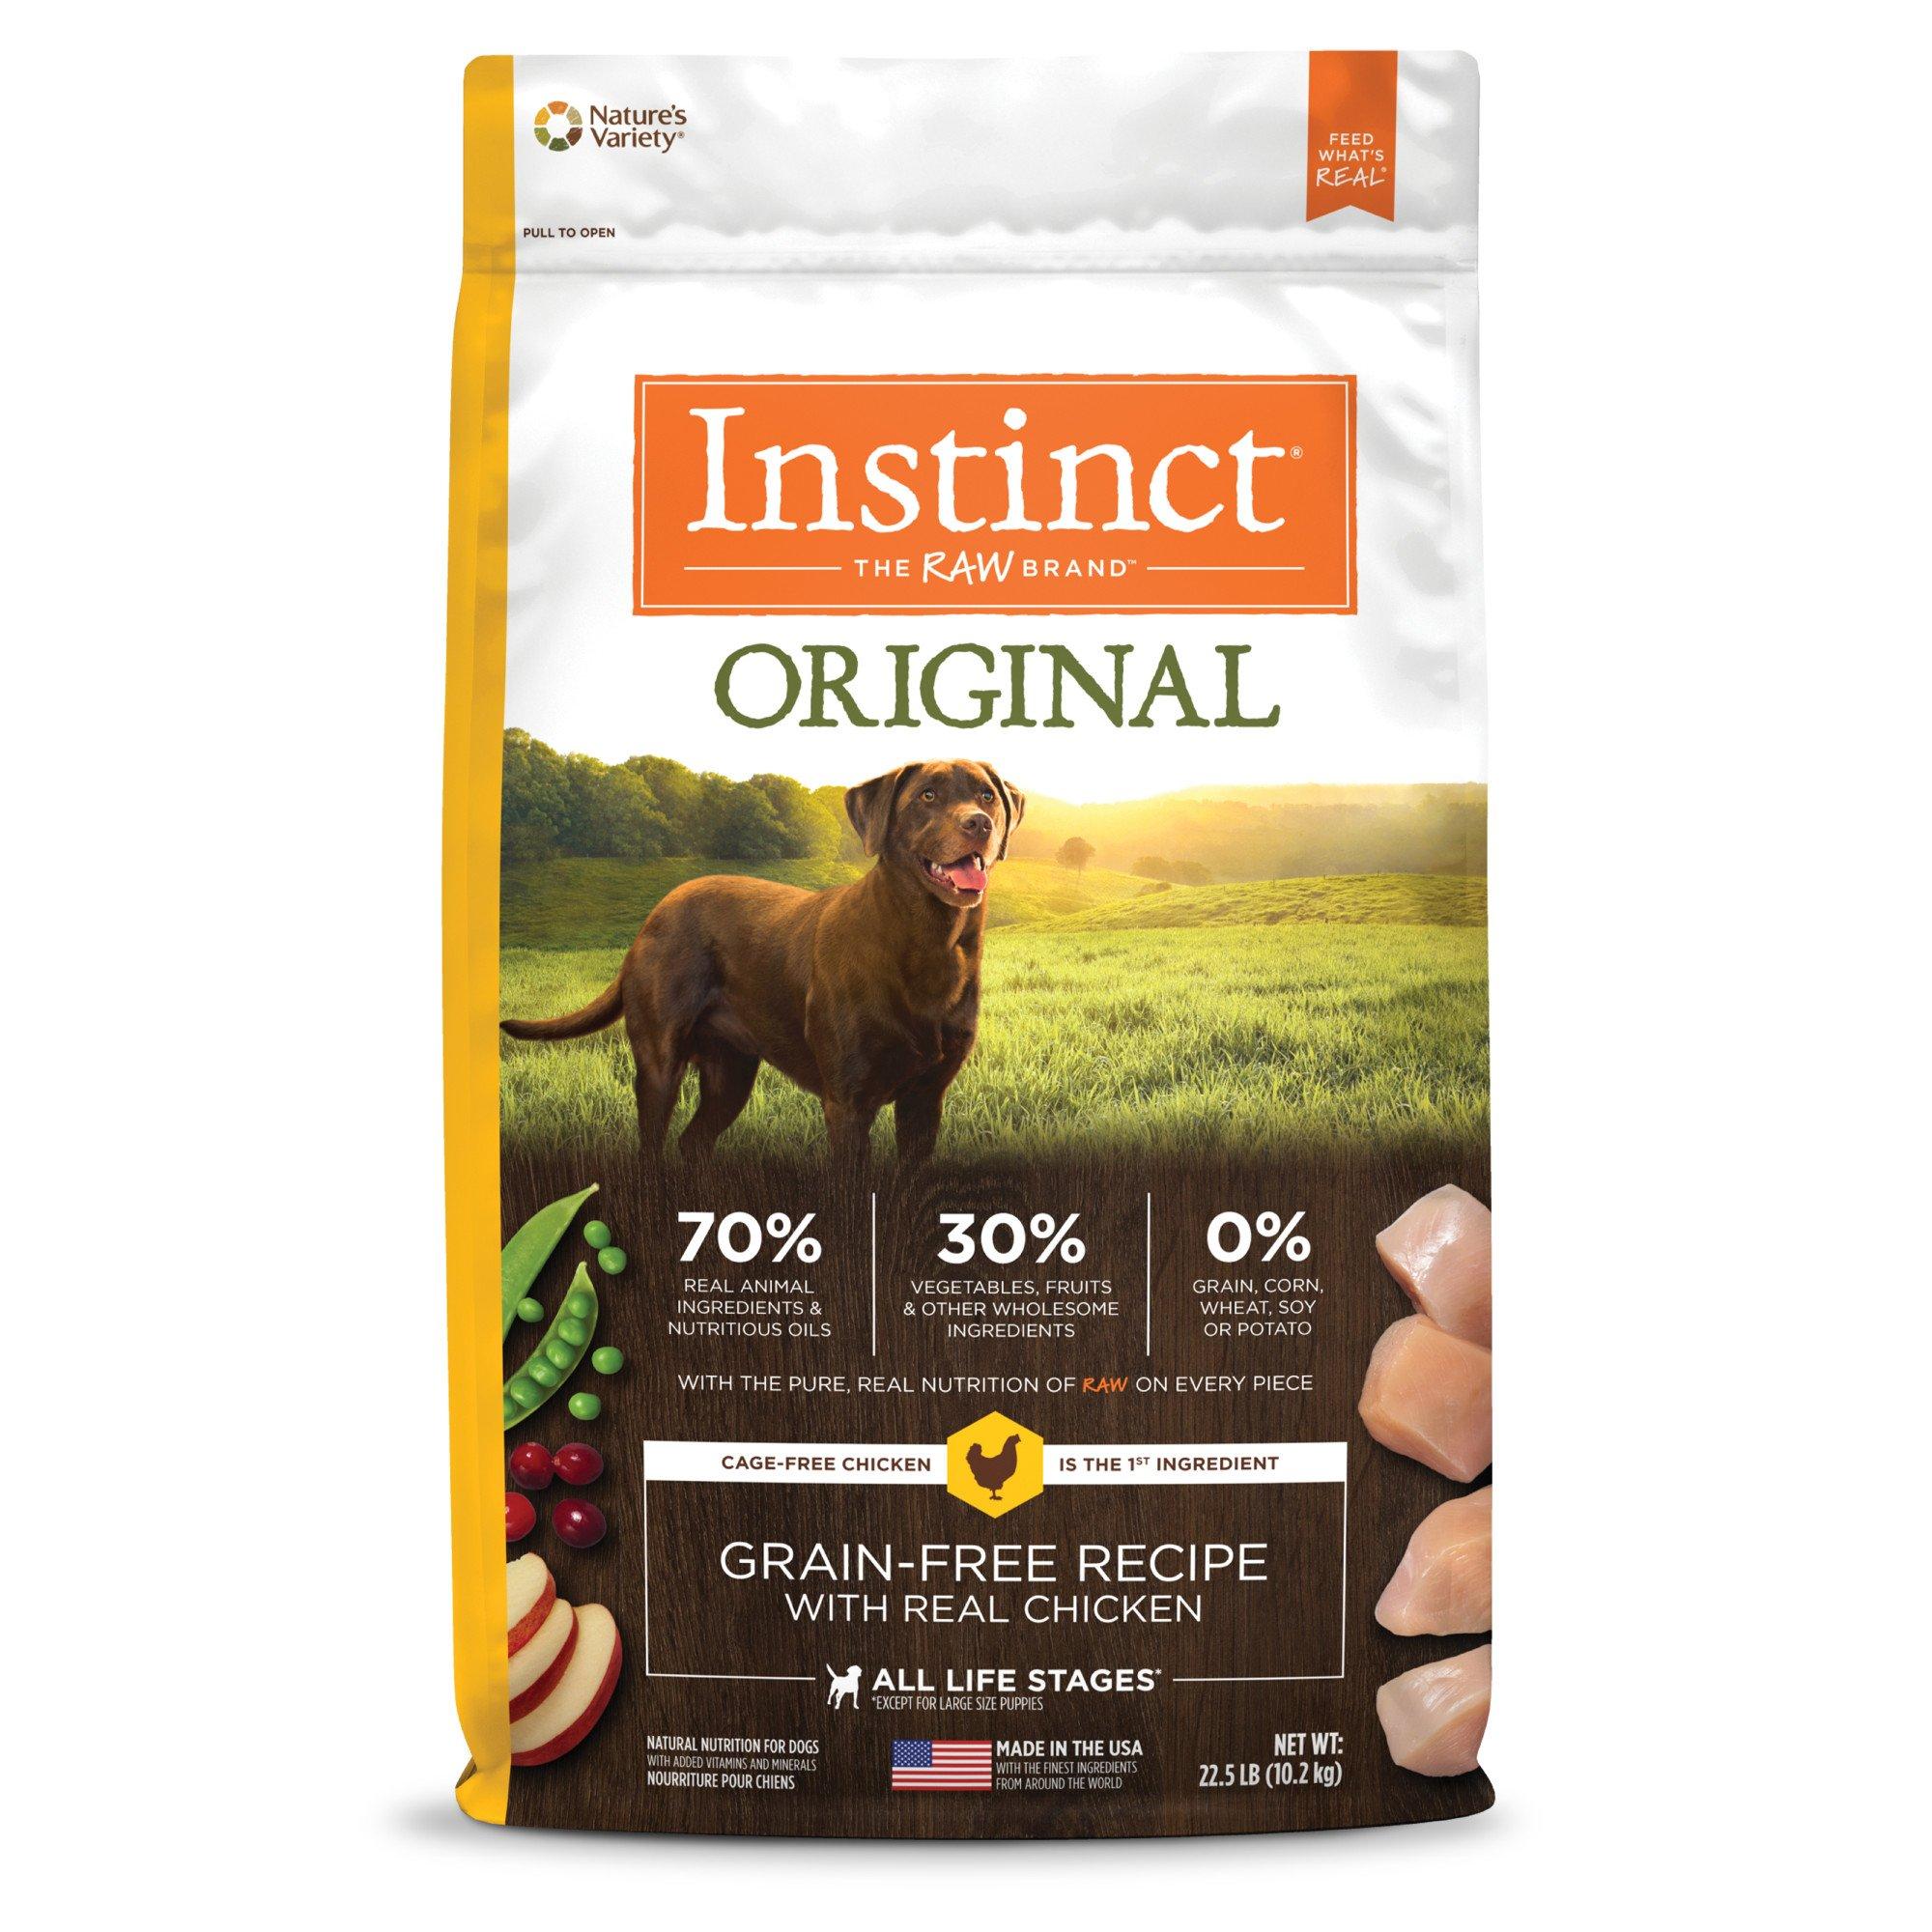 Nature's Variety Instinct Grain-Free Chicken Meal Dog Food